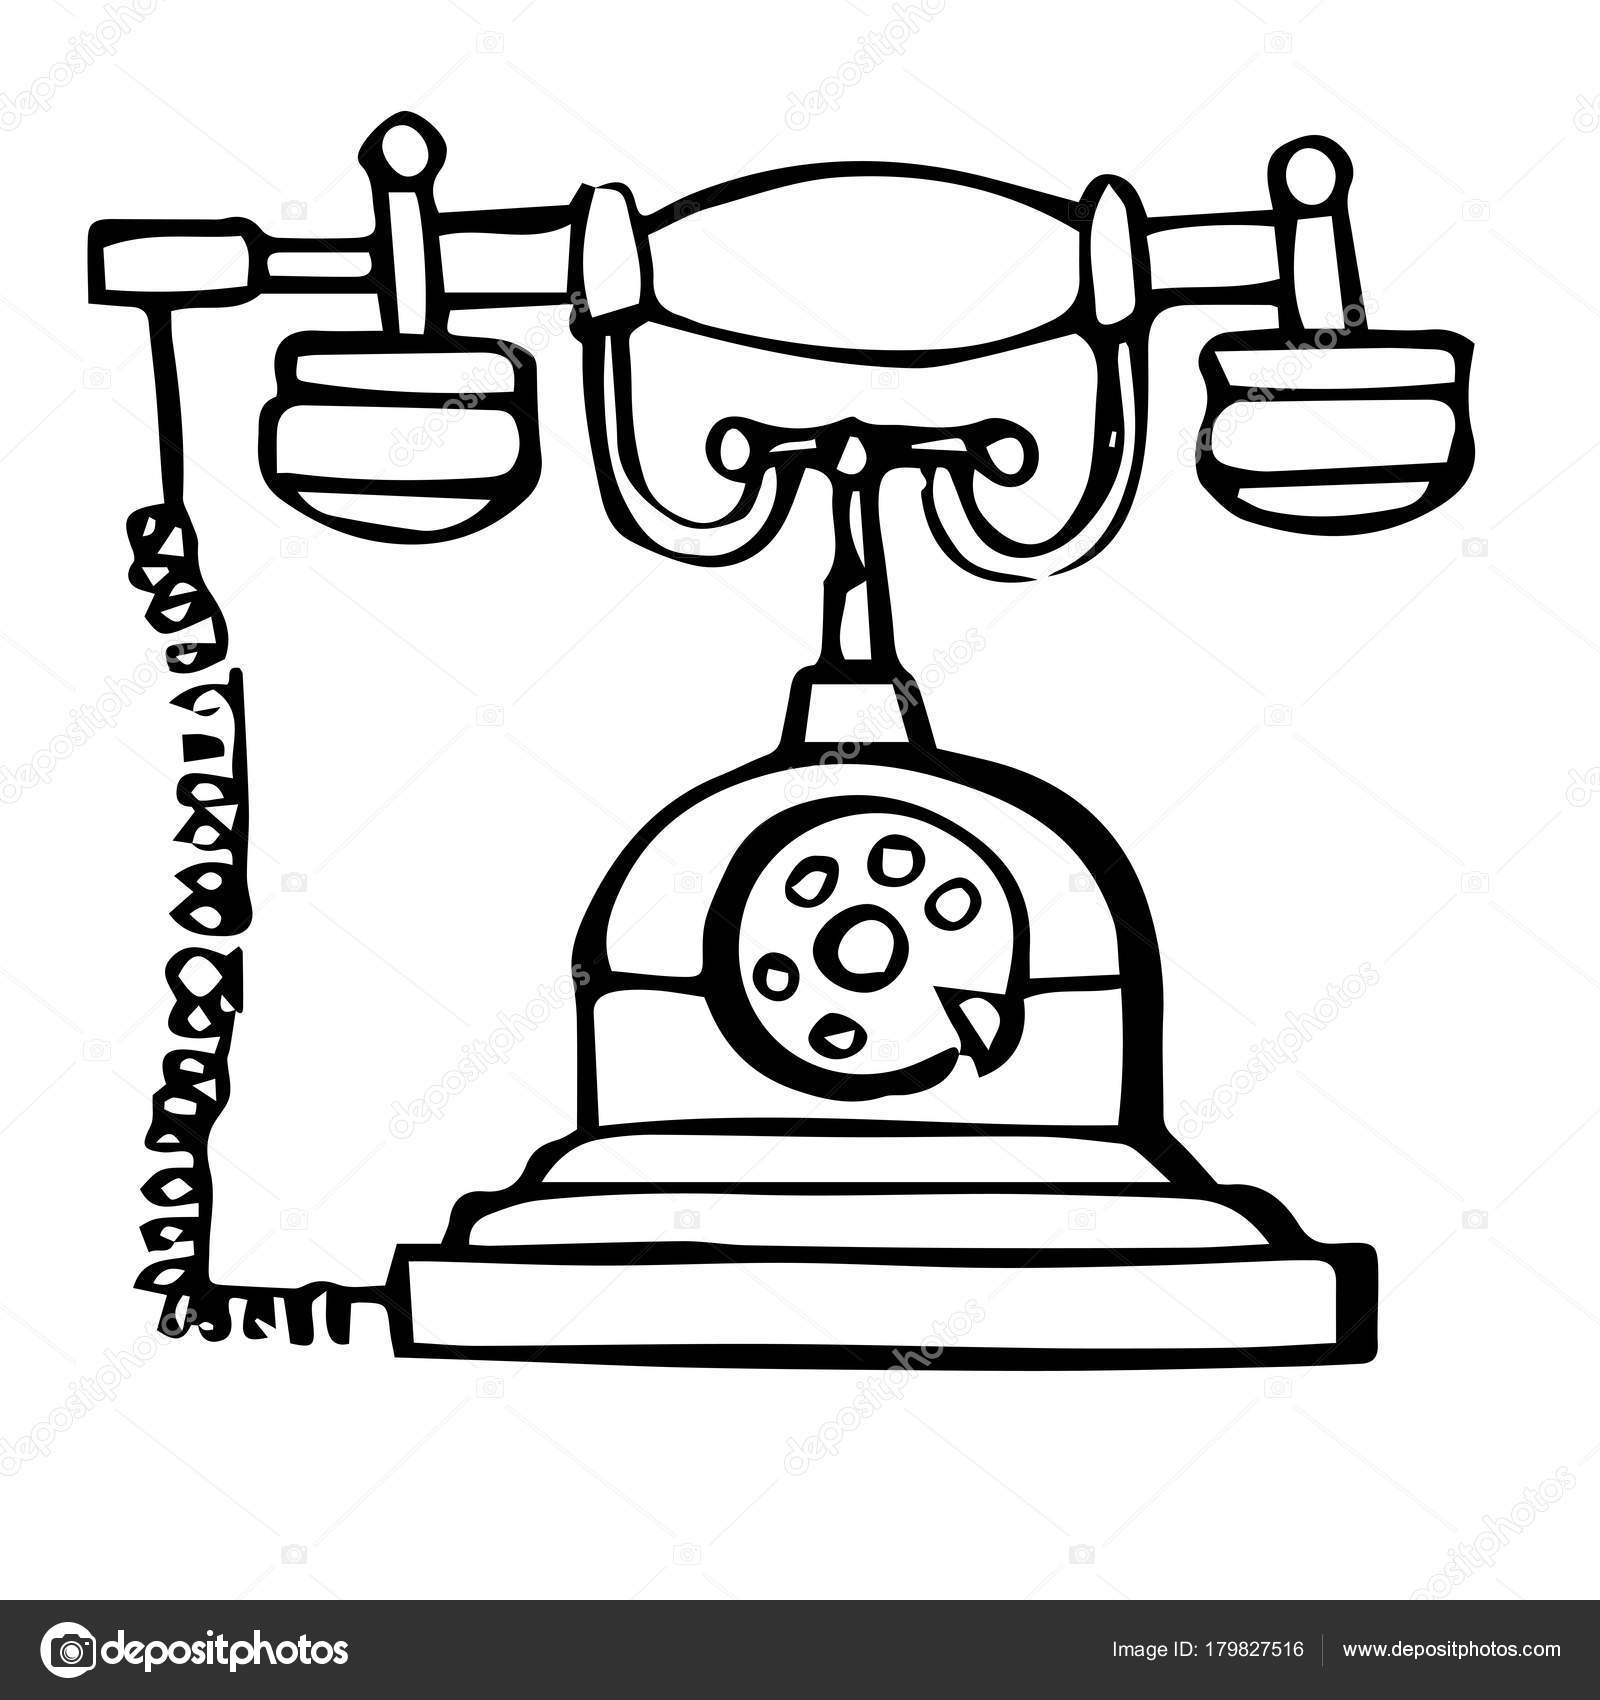 Imágenes Telefono Fijo Para Colorear Dibujo De Teléfono Retro